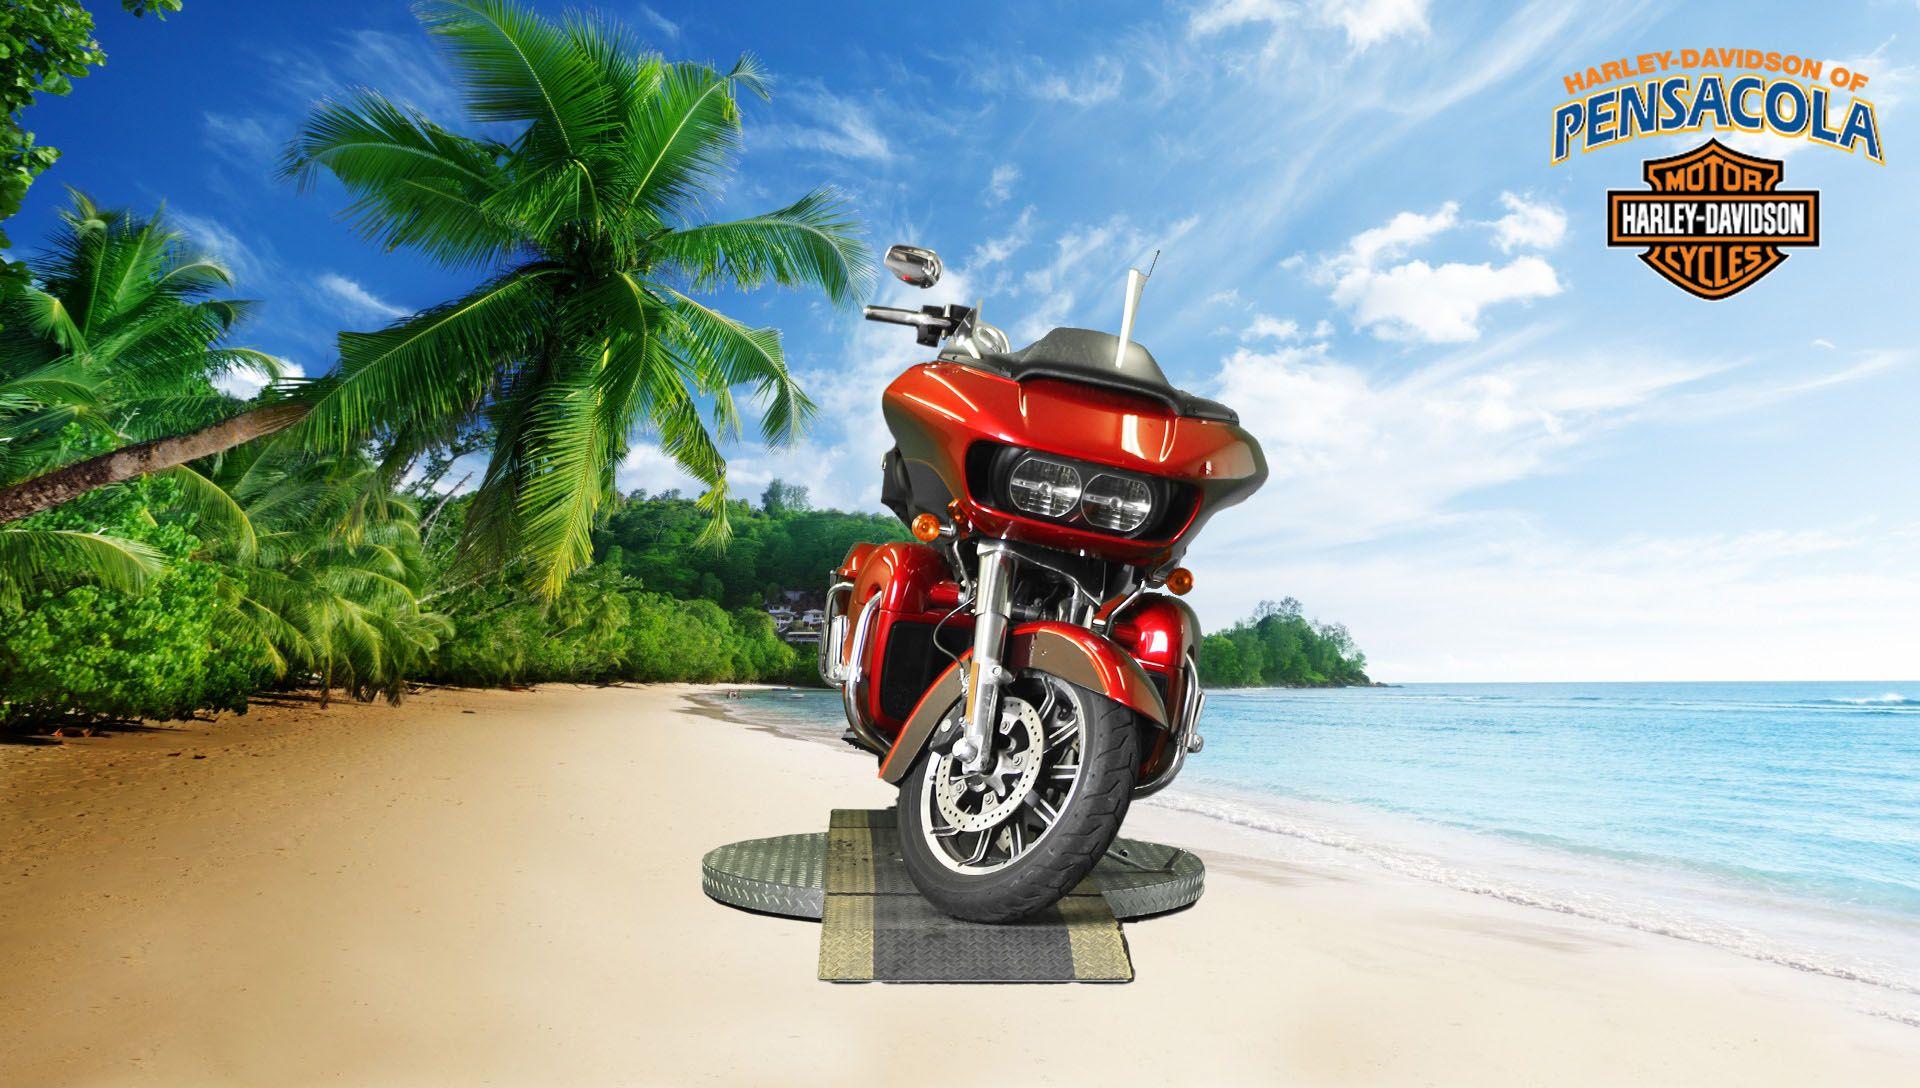 Pre-Owned 2018 Harley-Davidson Road Glide Ultra FLTRU